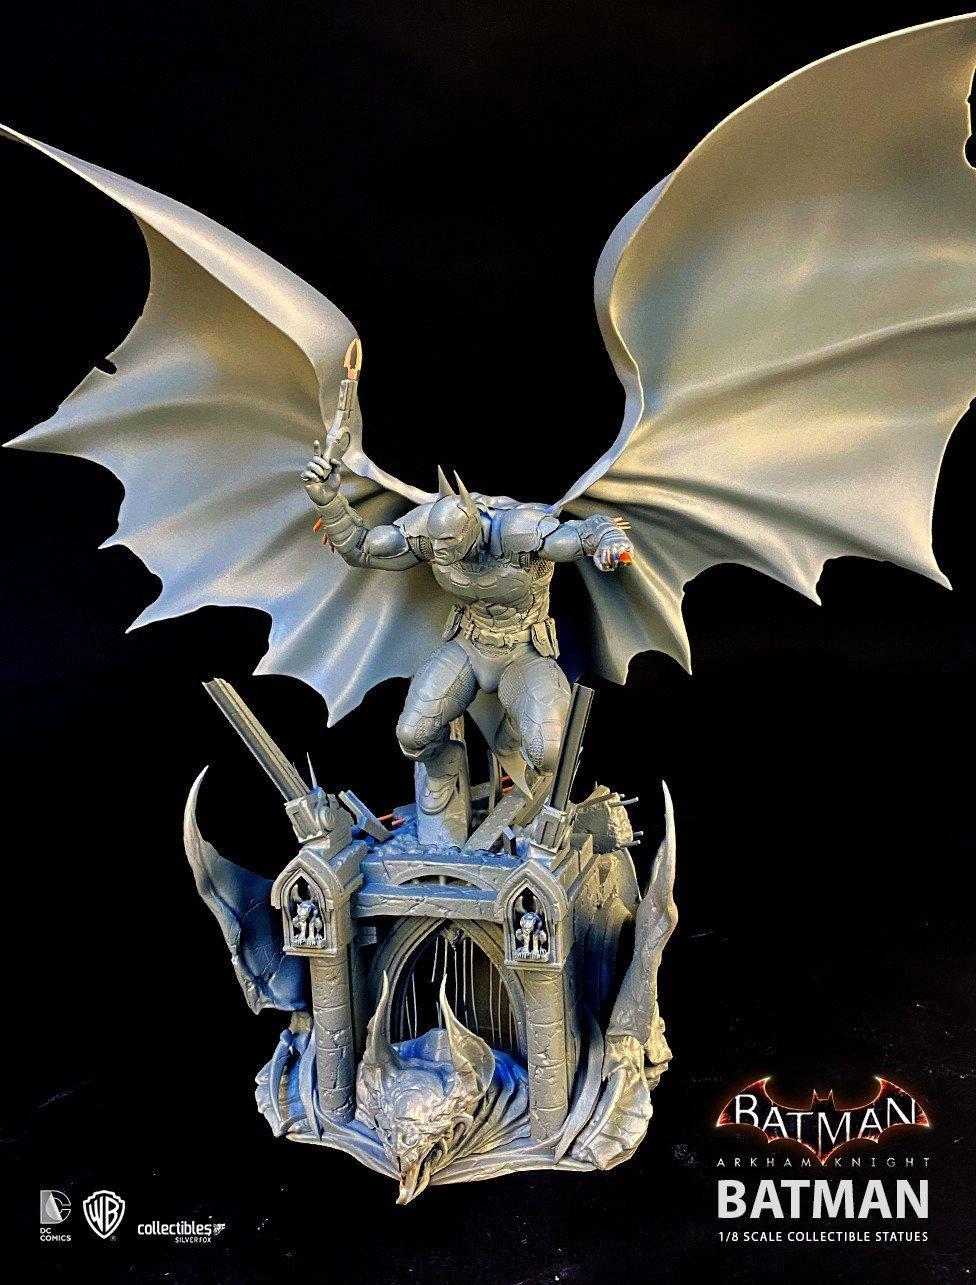 Batman siver fox collectibles batman arkham knight 1 8 scale statue11